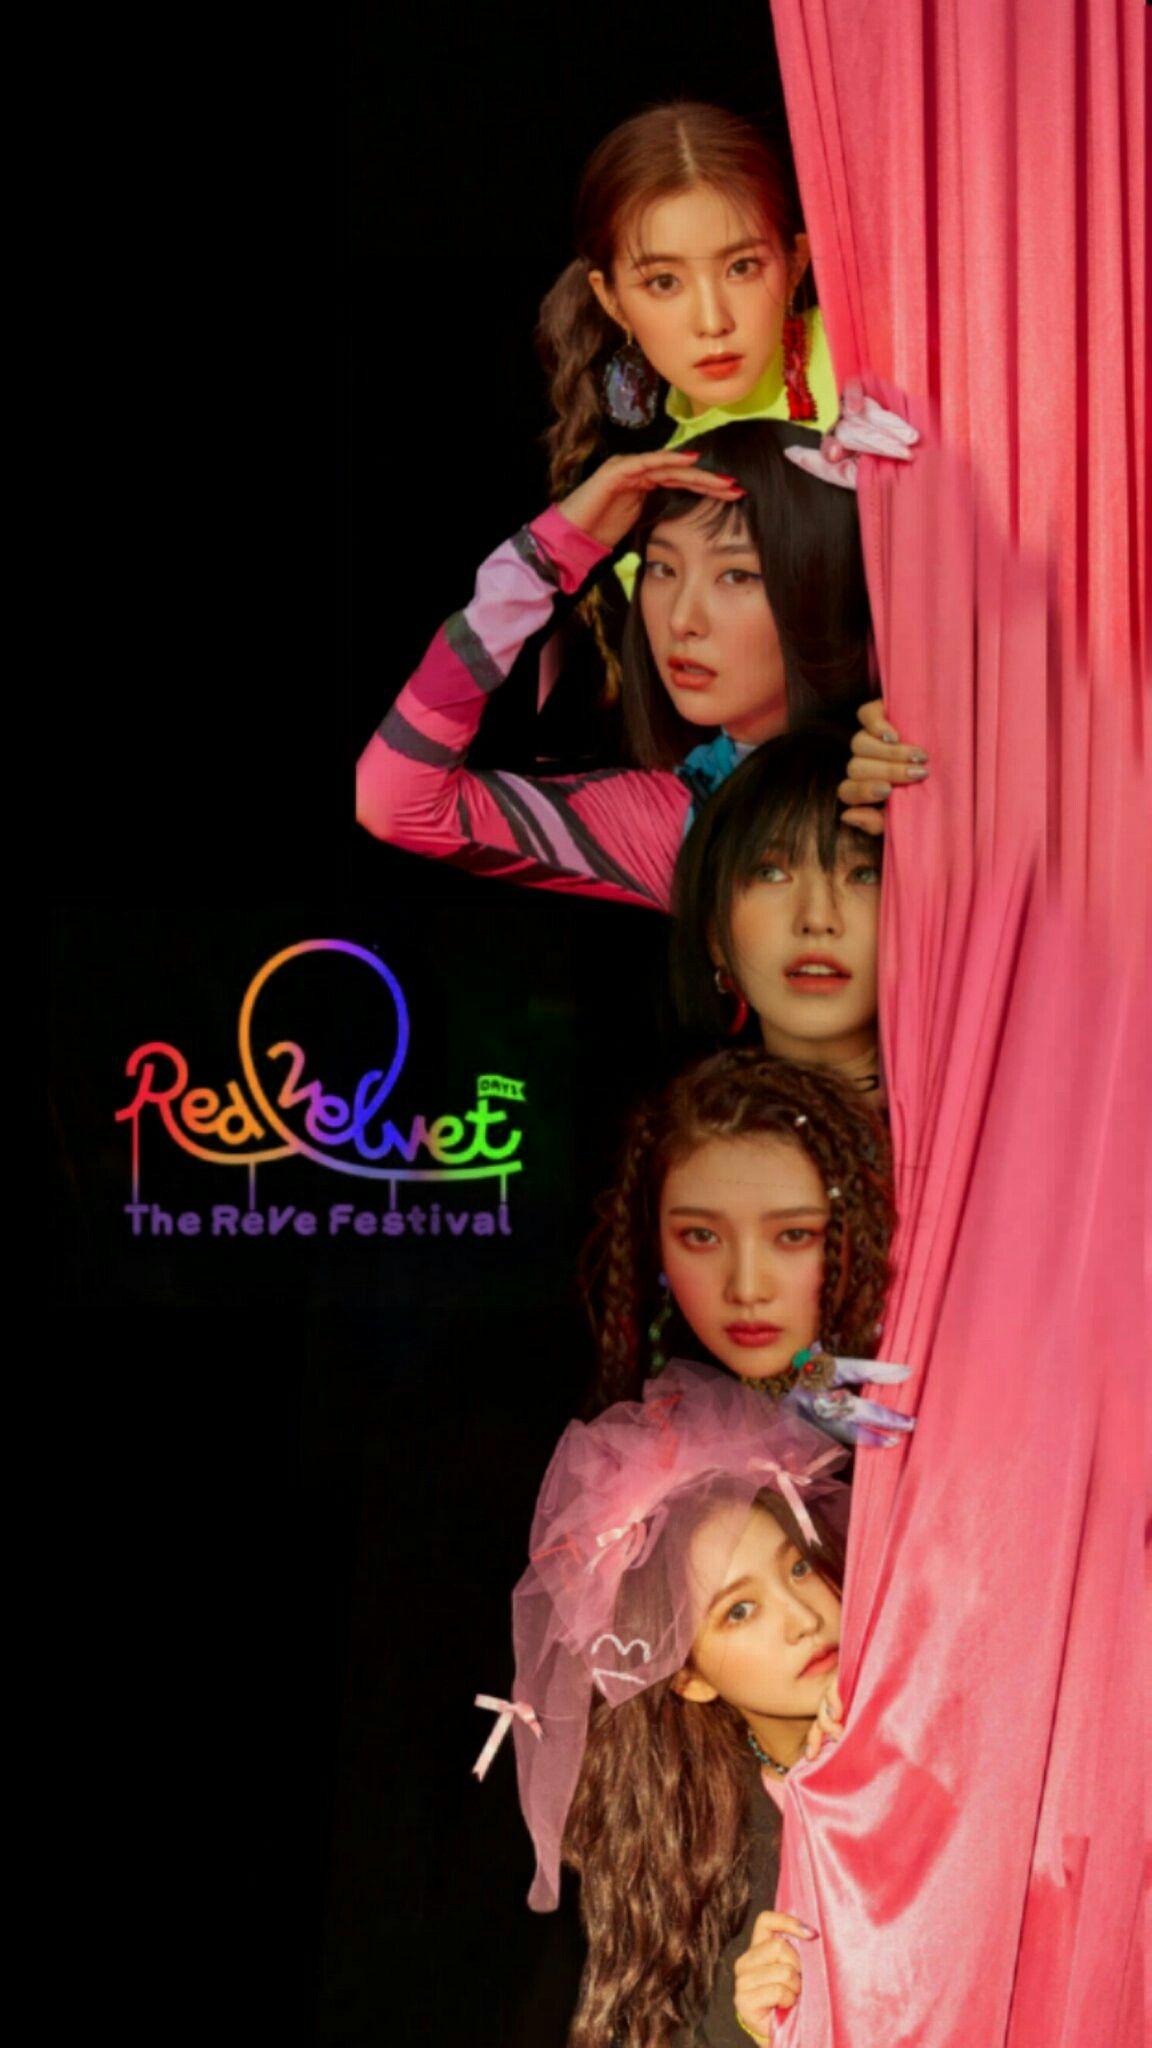 Red Velvet K Pop Mv Zimzalabim The Reve Festival Version 2 2019 Wallpaper Lockscreen Fondo De Pantalla Hd Iphone Seulgi Joy Irene We Wallpaper Ponsel